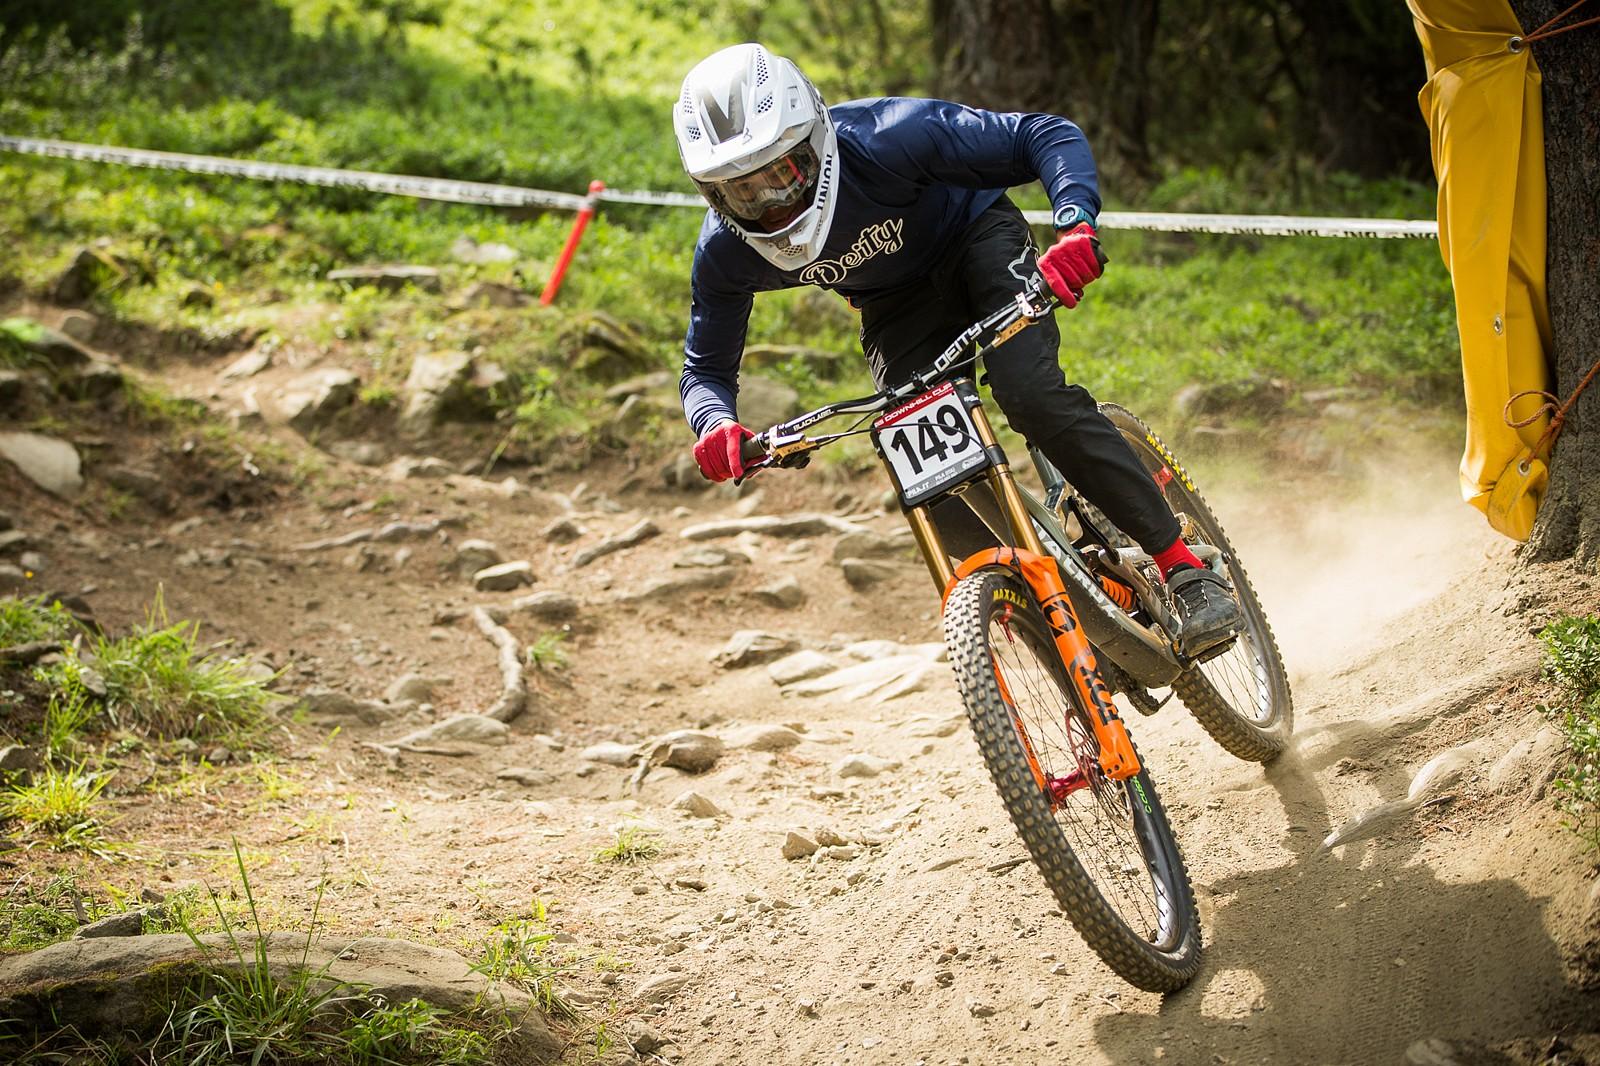 Tuhoto Akiri Pene - Elite Men's Winner - iXS Downhill Cup #2 Pila - Mountain Biking Pictures - Vital MTB